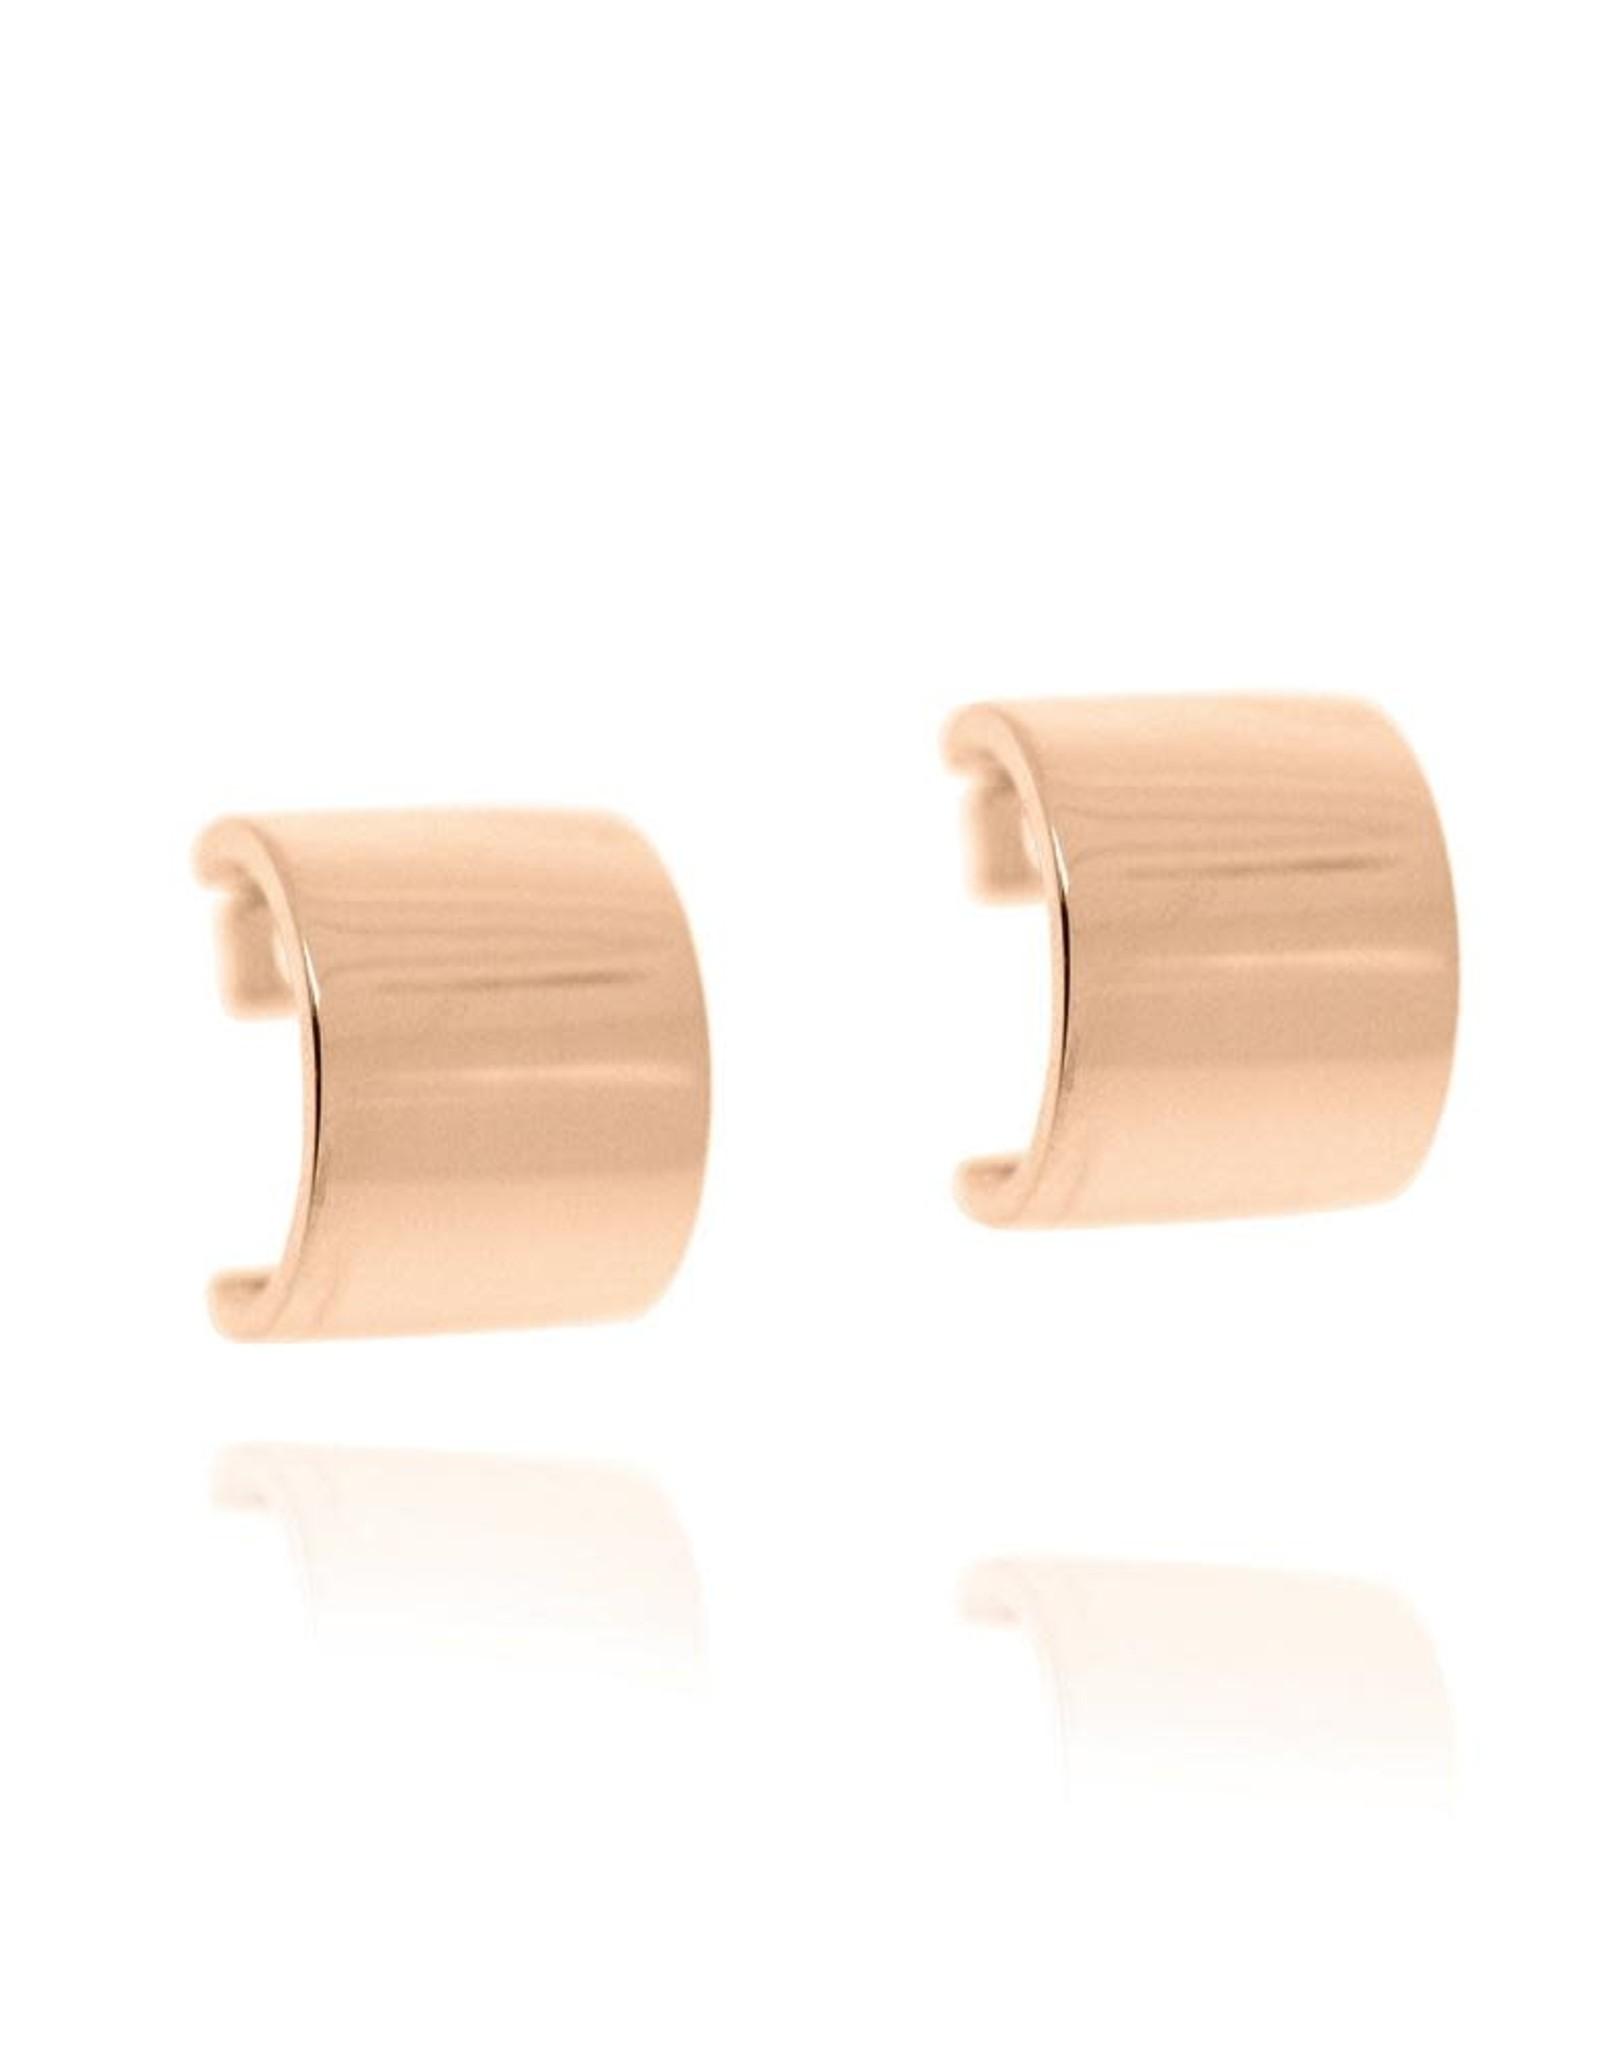 Linda Tahija Block Hoop Earrings, Rose Gold